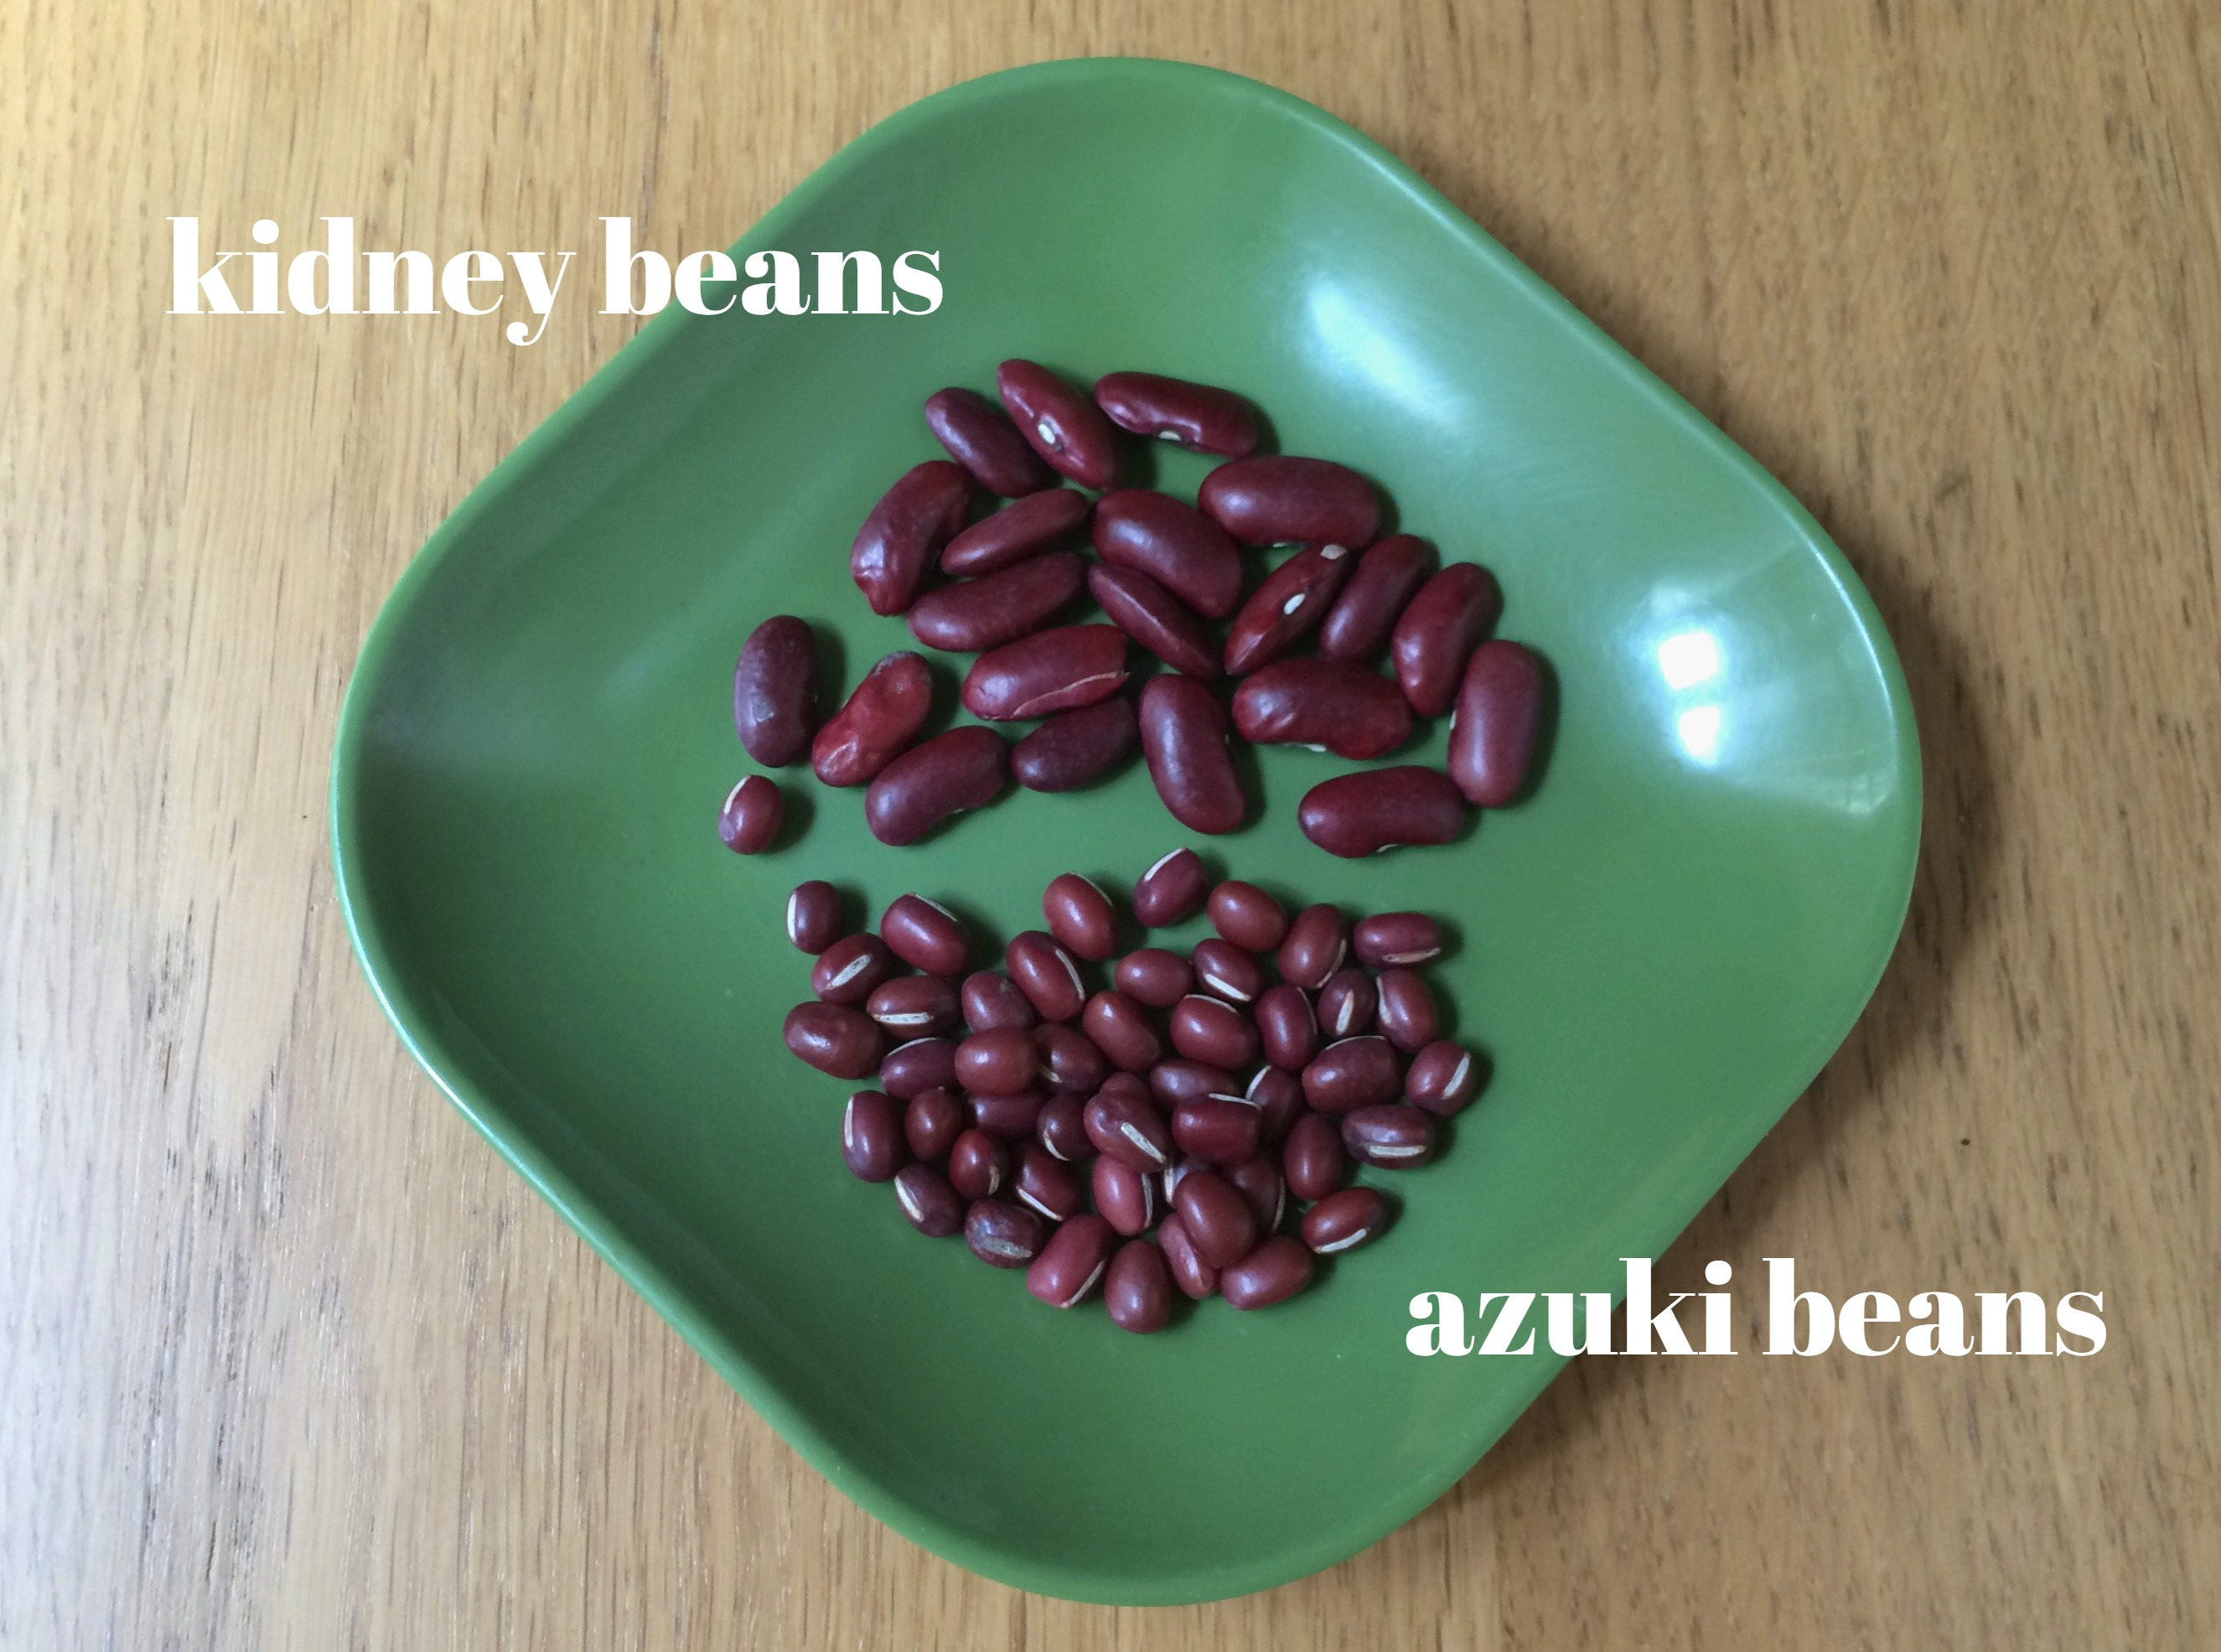 kidney vs. azuki